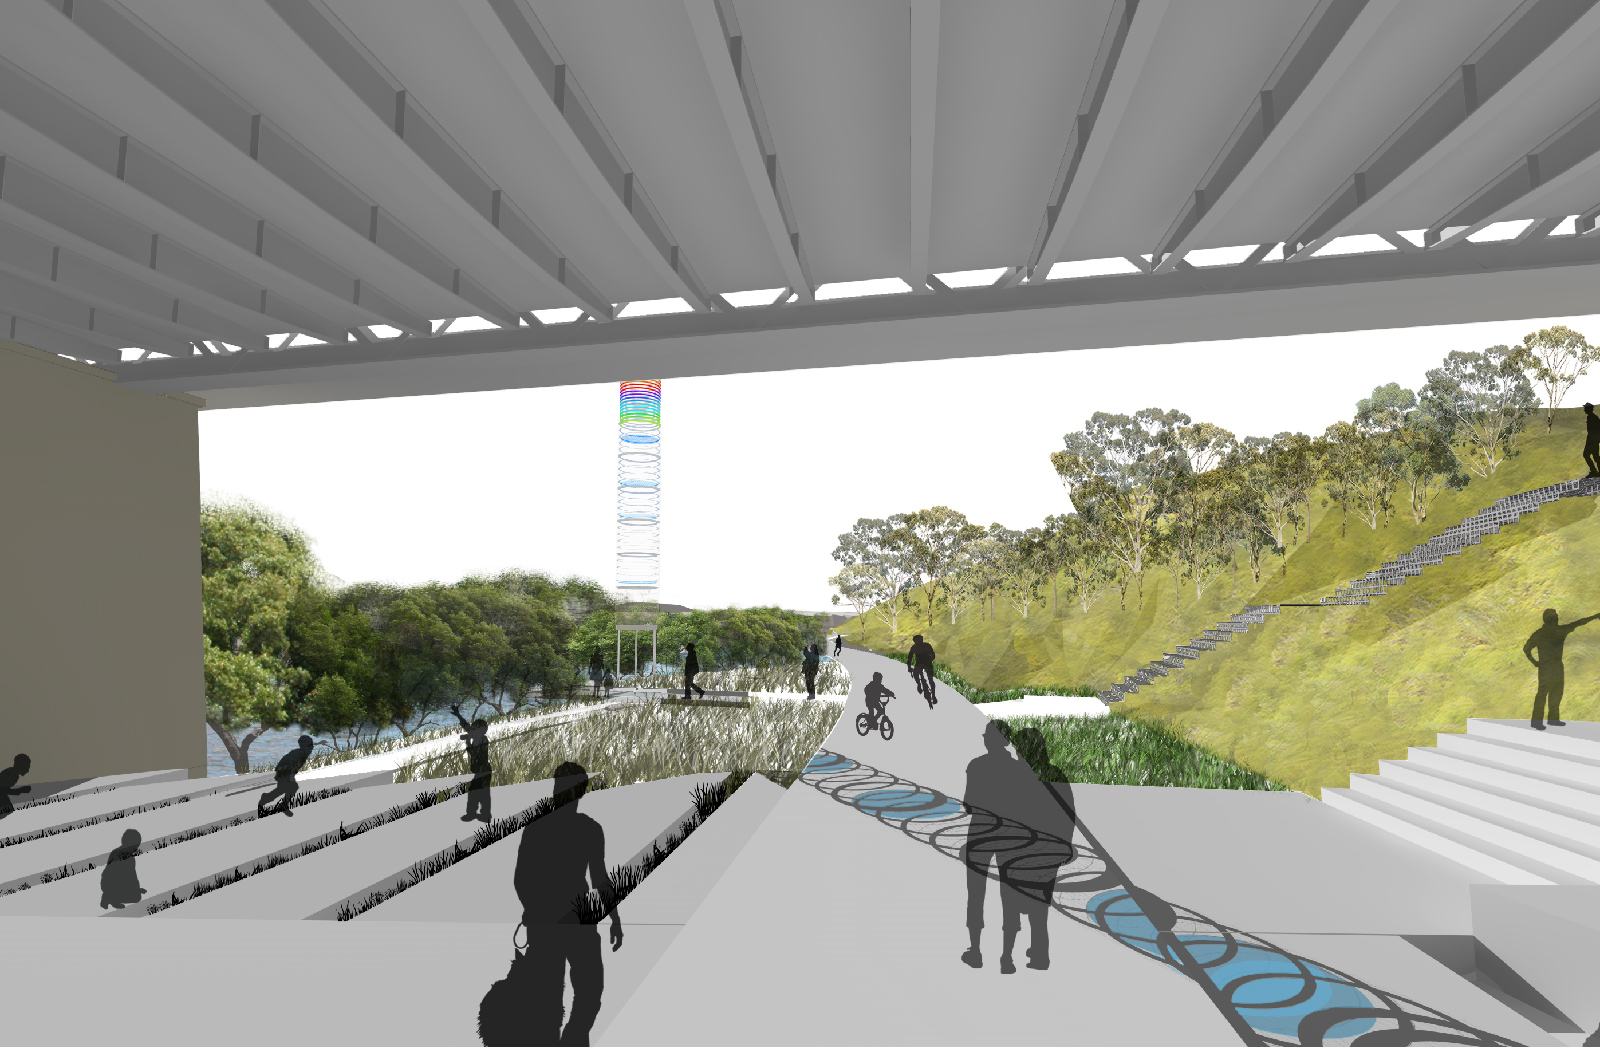 Parrametre - an urban design project by McGregor Westlake Architecture